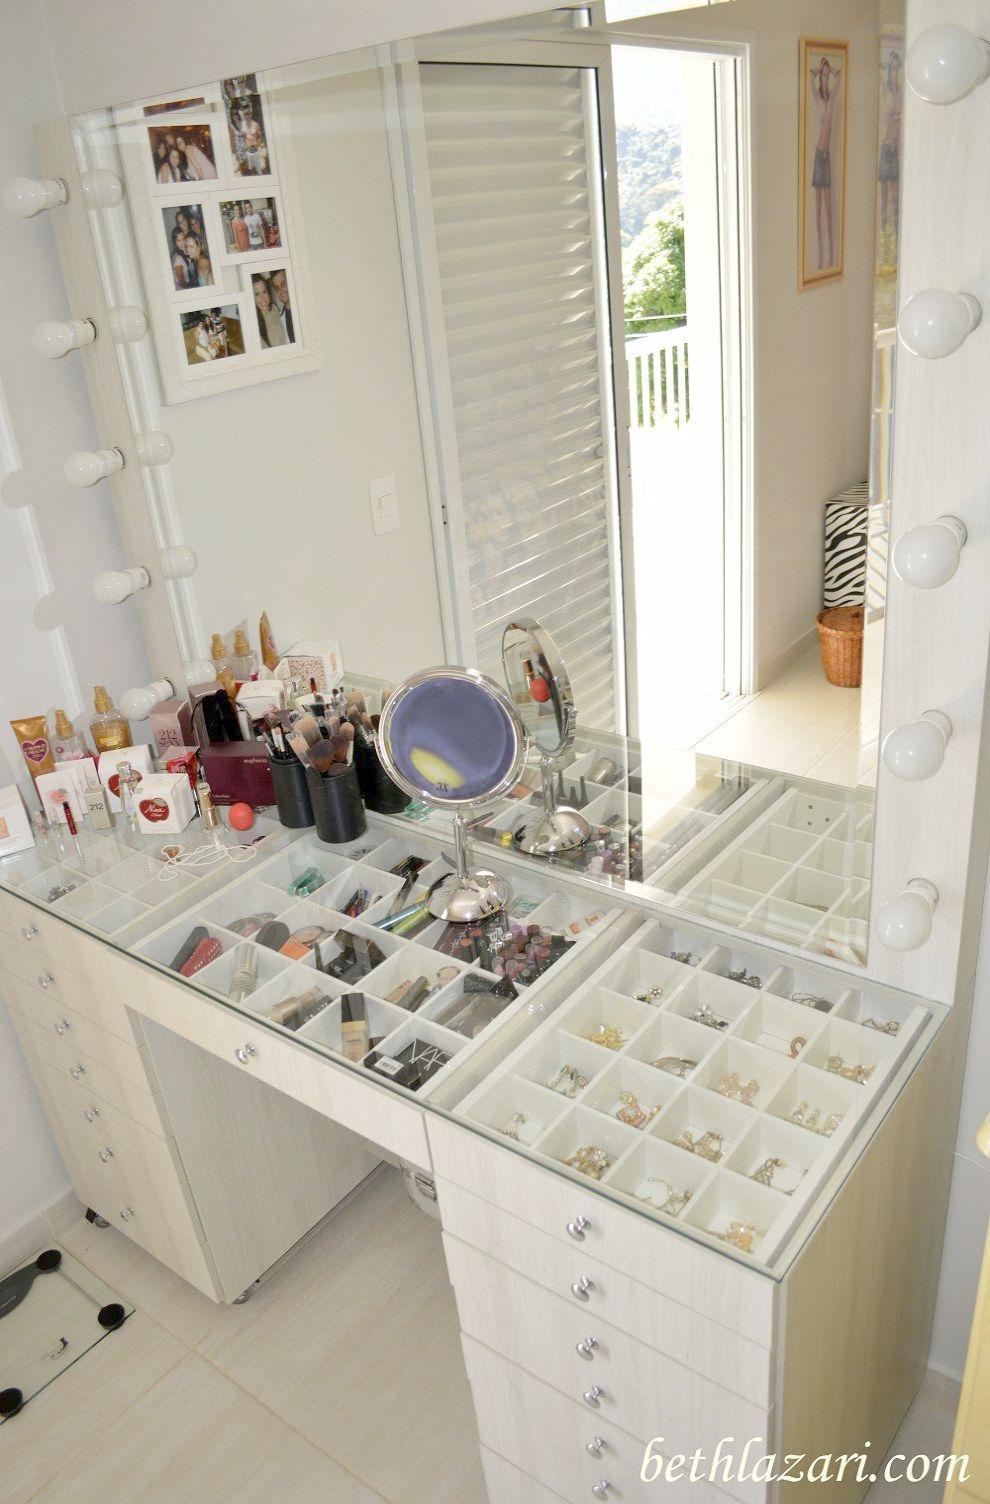 Makeup Looks Night Out Per Makeup Revolution Kalendarz Adwentowy Underneath Makeup Artist Programs Because Makeup Vanity For Bedroom M Beauty Room Home Design